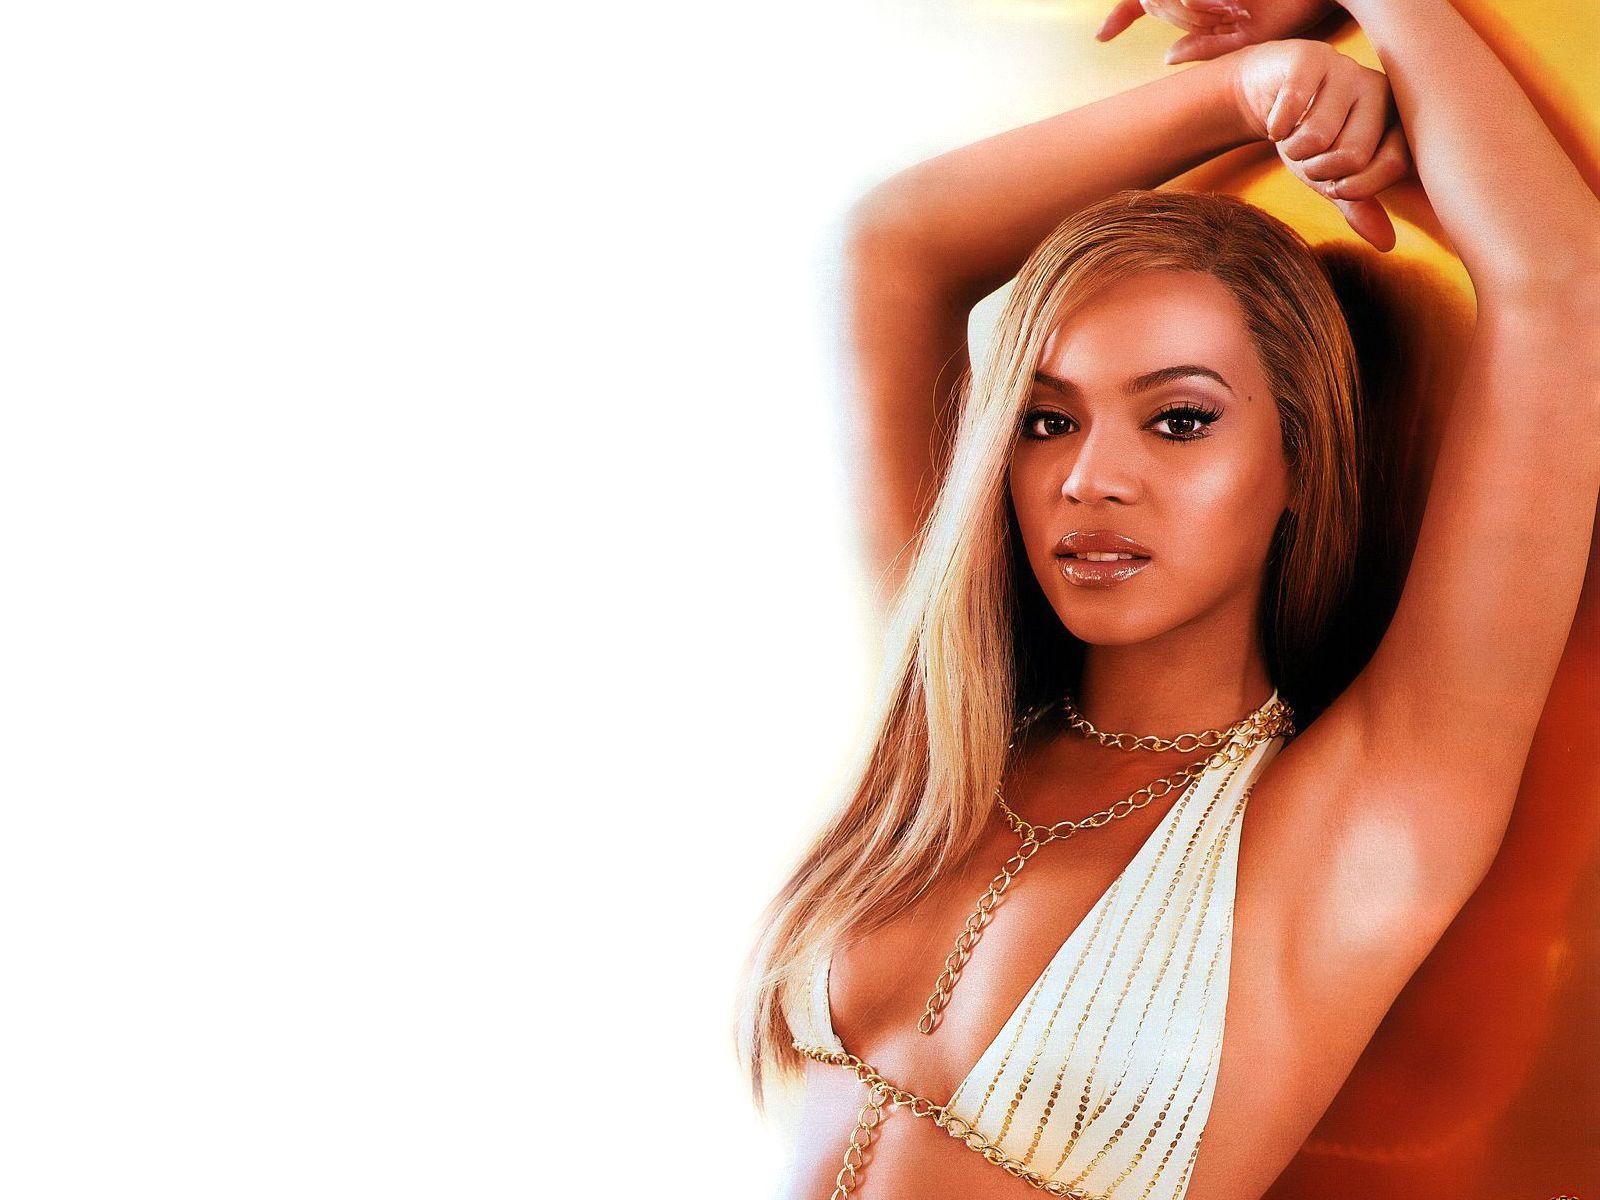 http://4.bp.blogspot.com/-JkzNgouKCAU/TxB1GdiS9FI/AAAAAAAACgo/SAciTWiNoZM/s1600/Beyonce-photos-2012.jpg